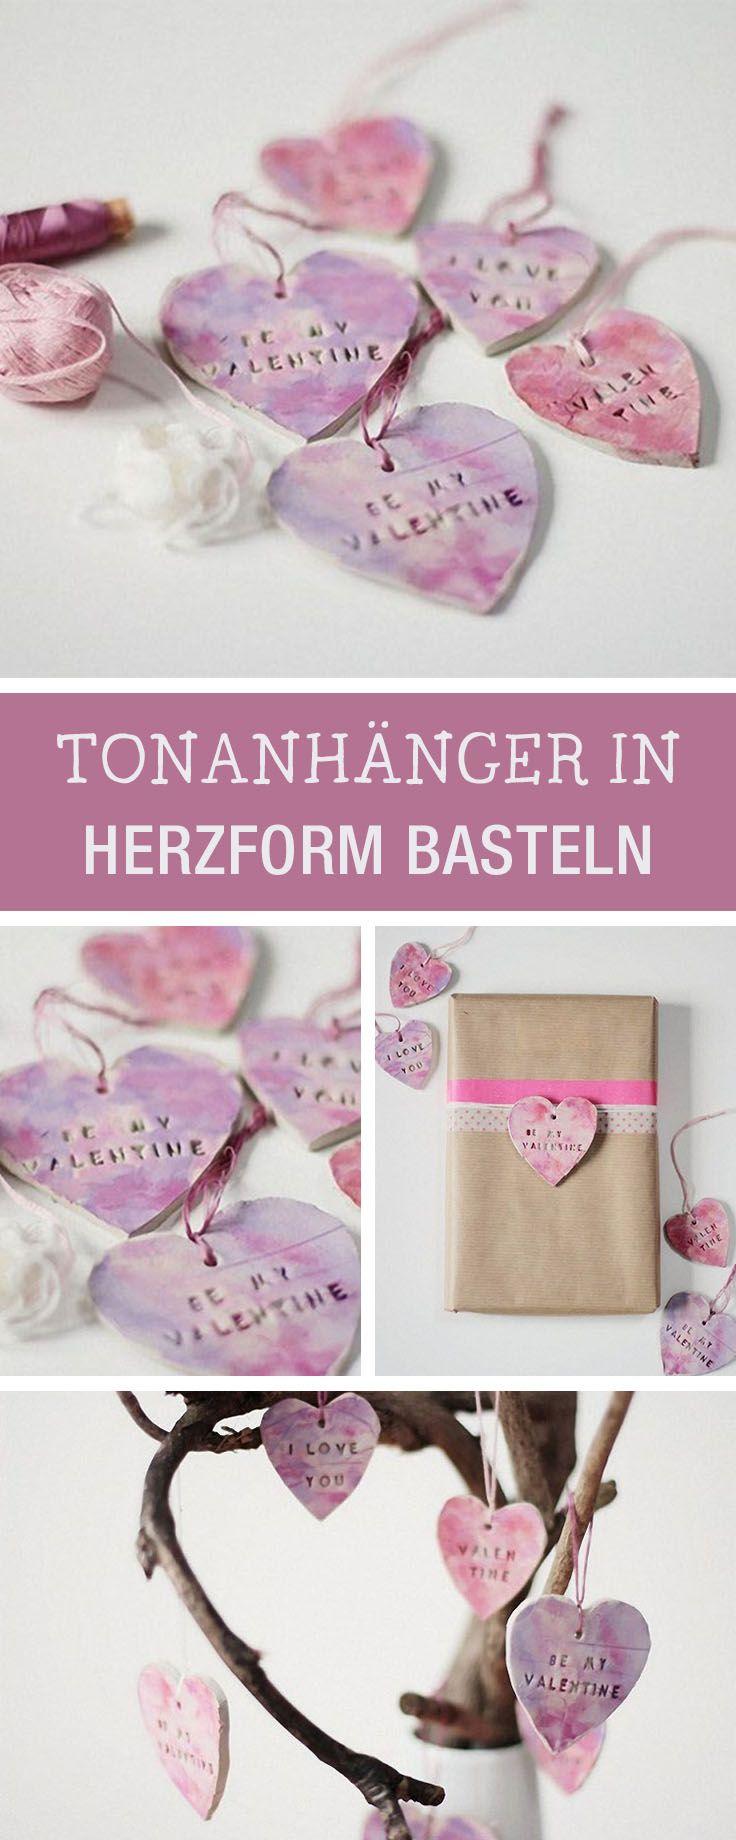 Romantisches DIY: Tonanhänger in Herzform basteln / craft romantic decor: heart shaped pendants made of clay via DaWanda.com